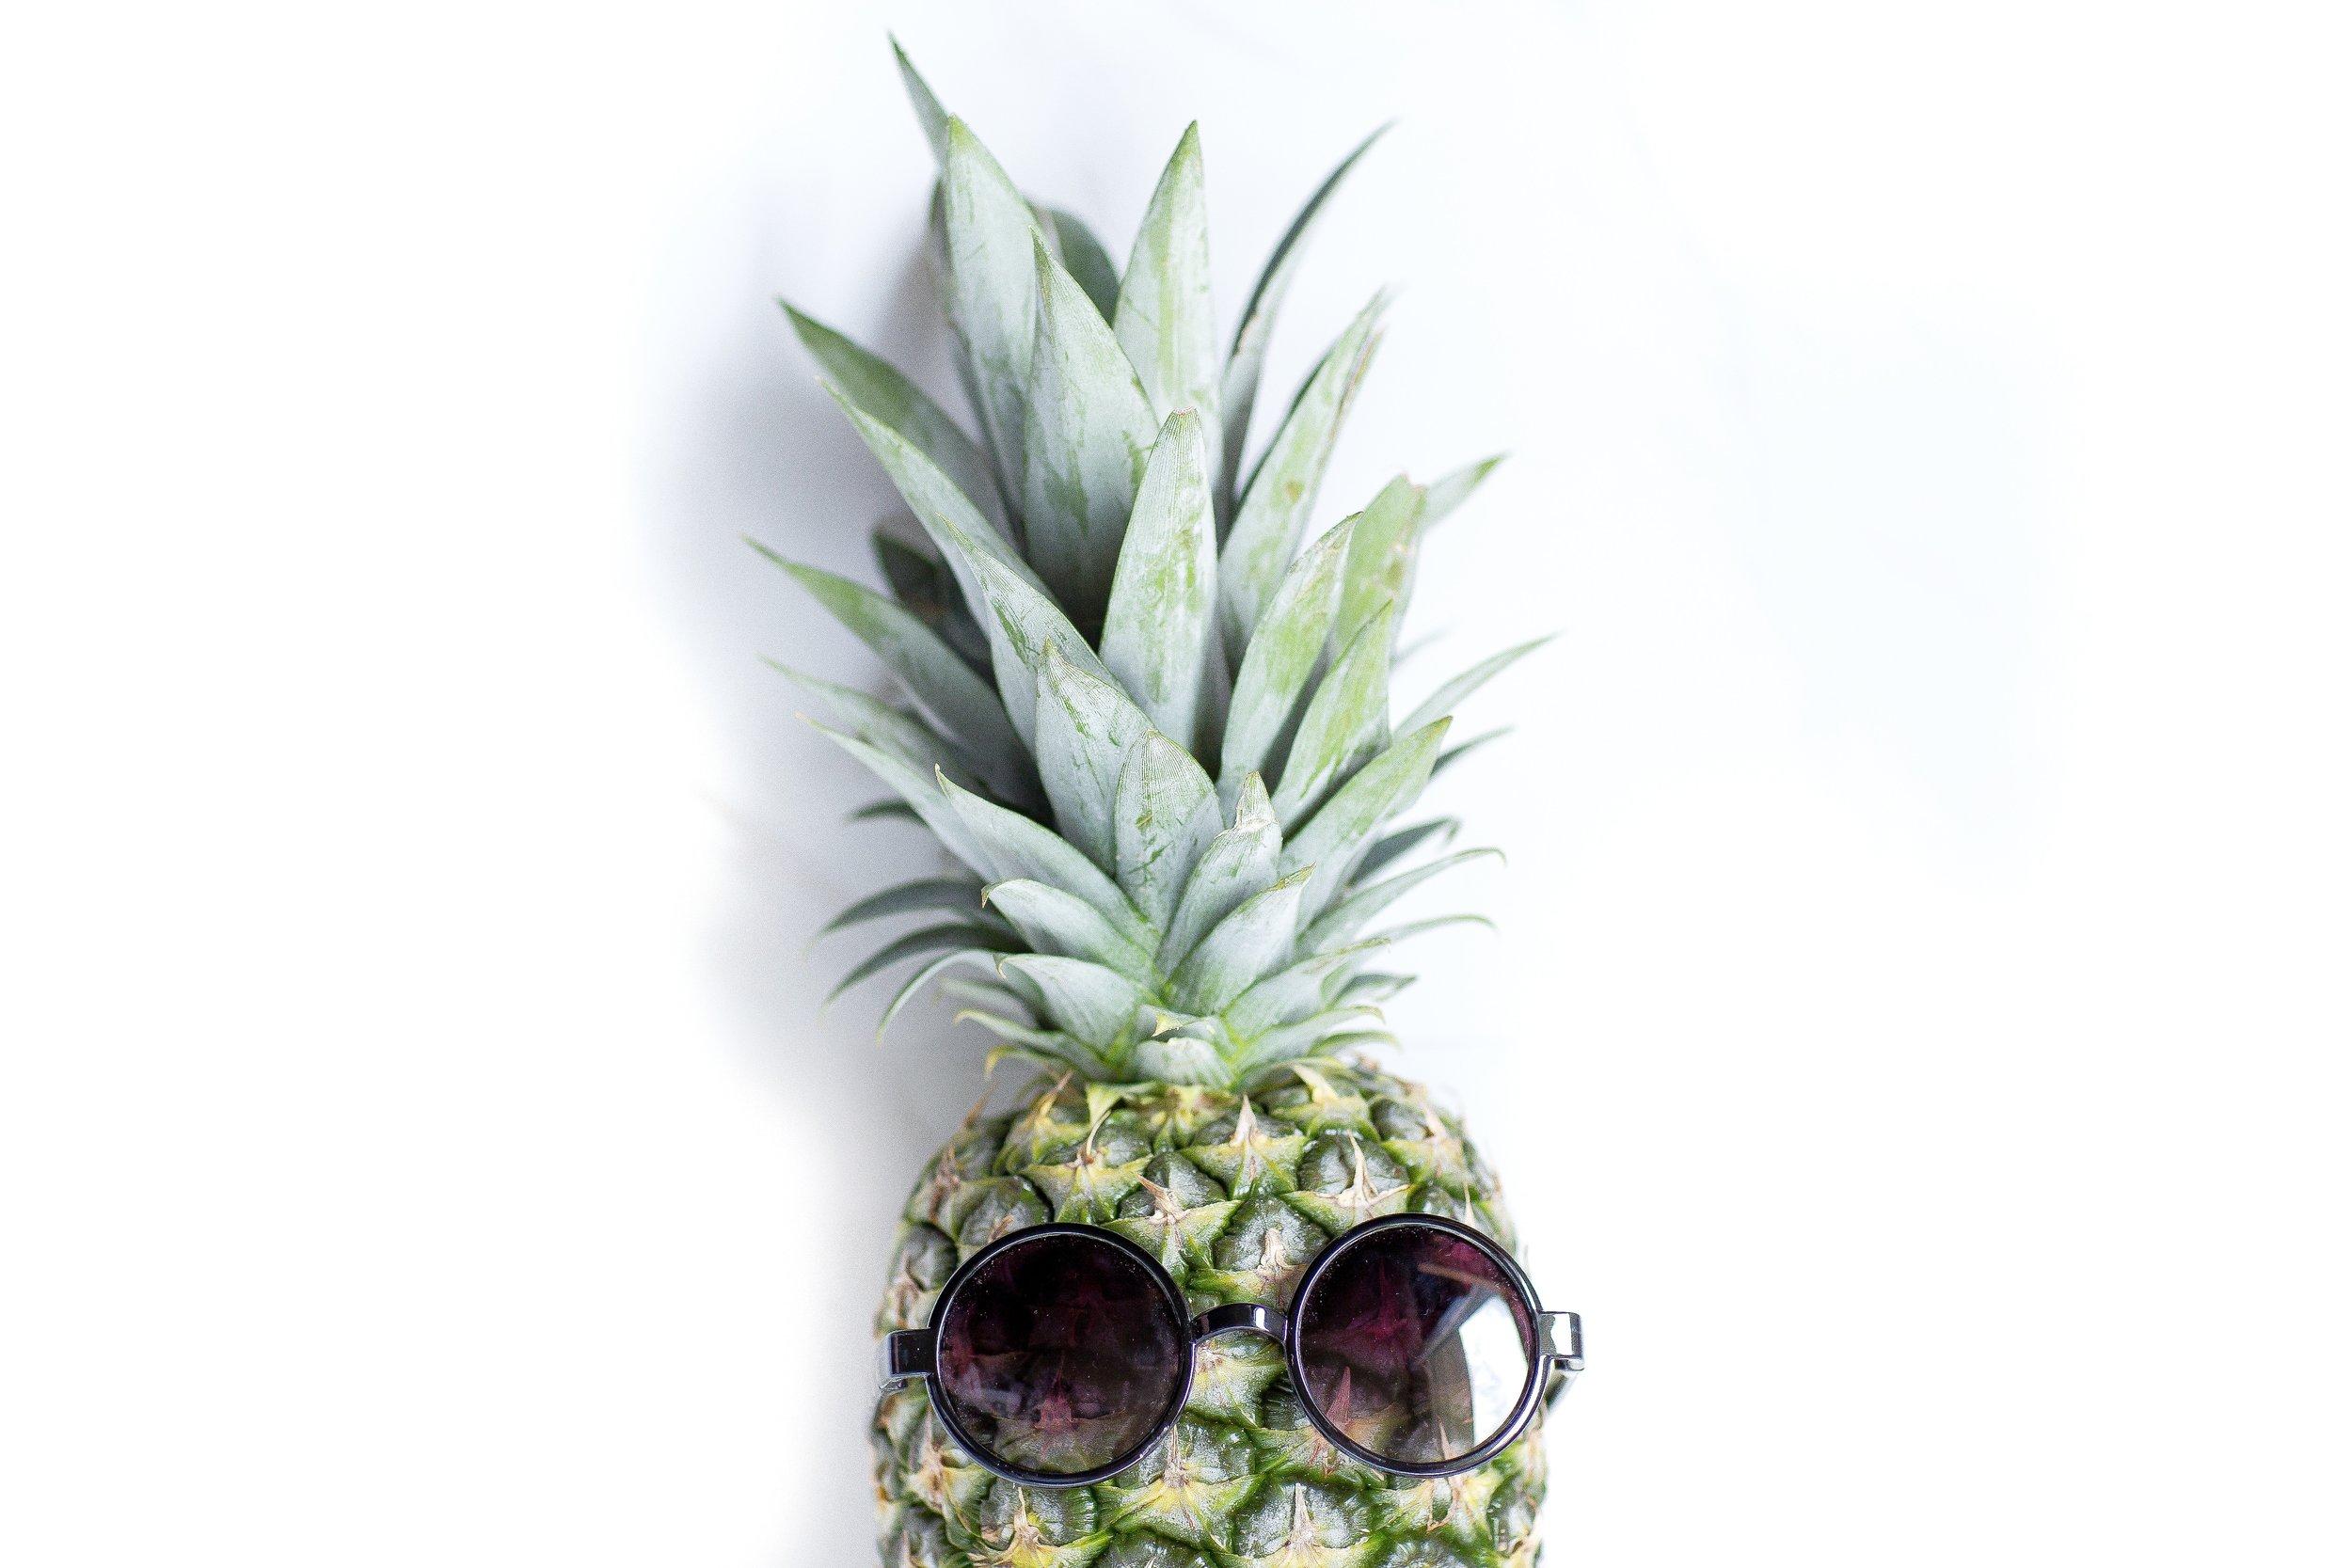 My financial freedom mascot! The freedom coconut! (I love coconuts)